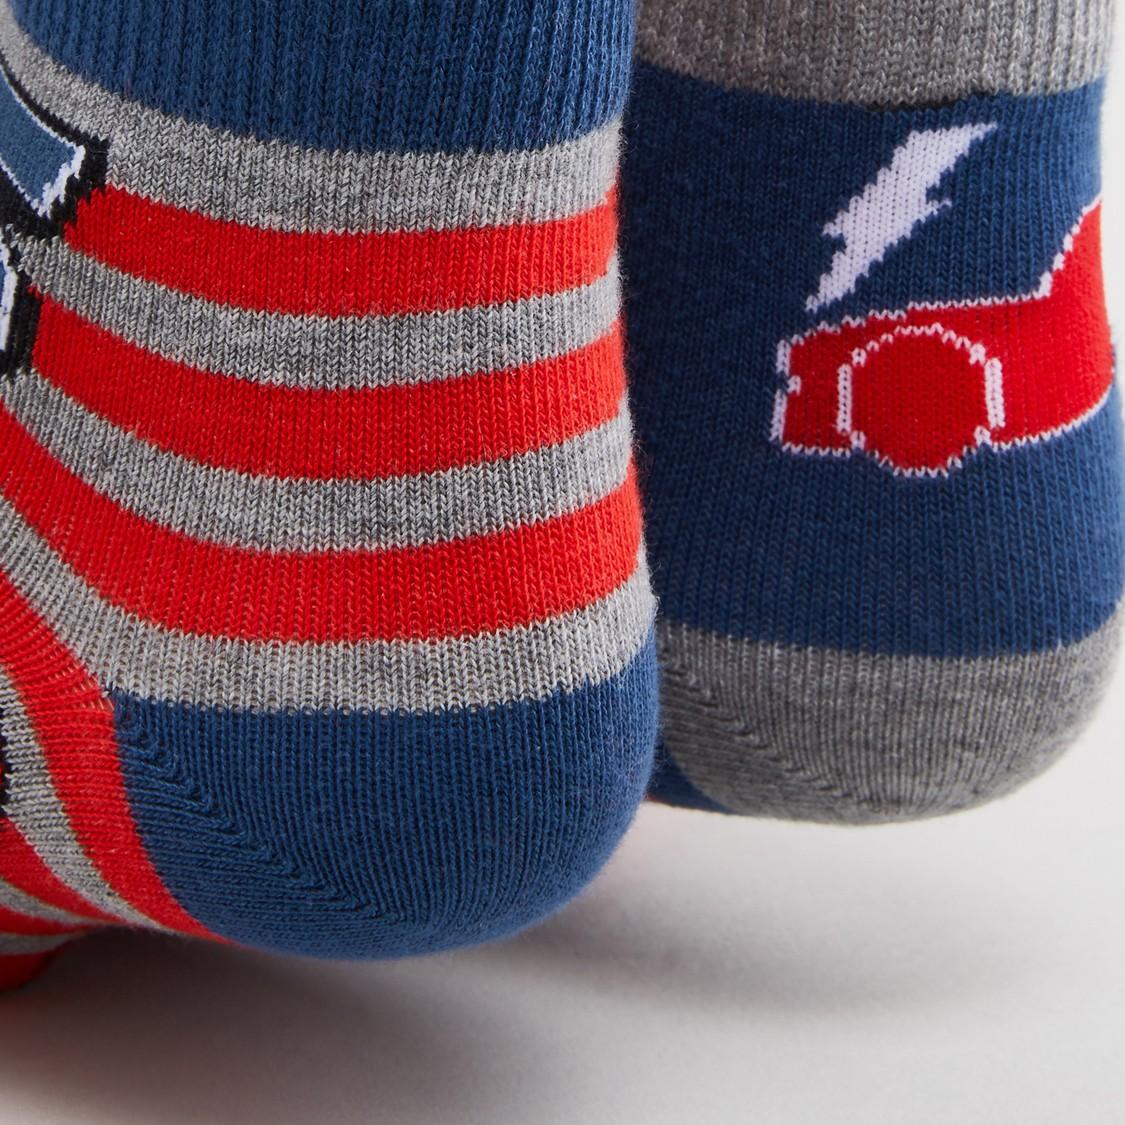 Set of 2 - Printed Ankle Length Socks with Cuffed Hem